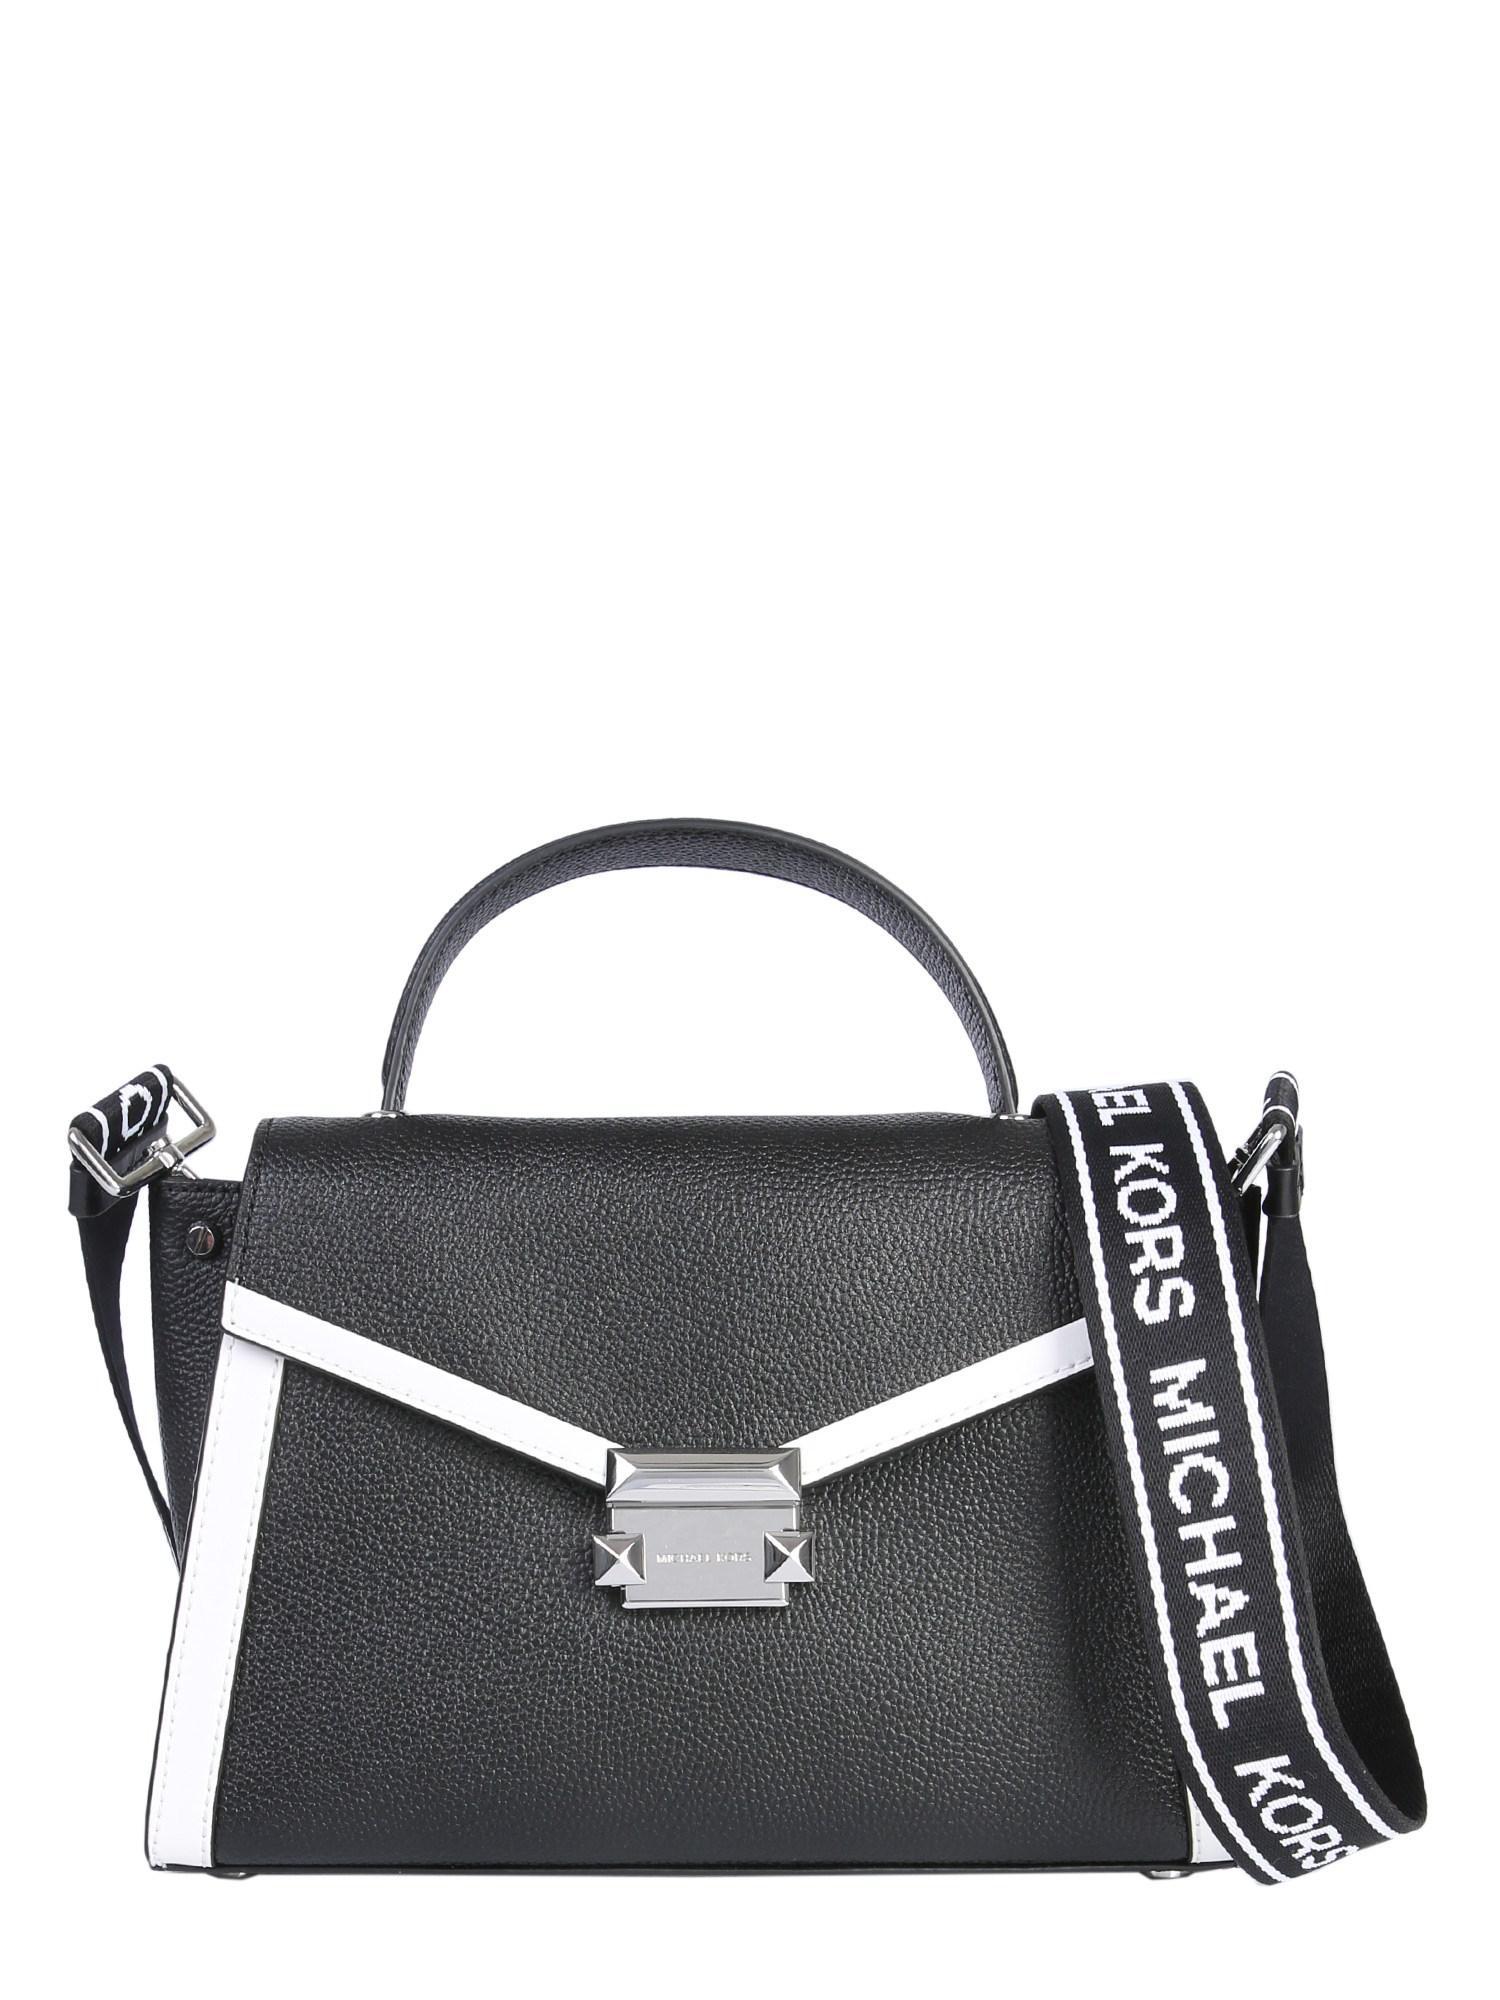 5c2bd5c7b207 Michael Michael Kors Medium Whitney Leather Handbag in Black - Lyst